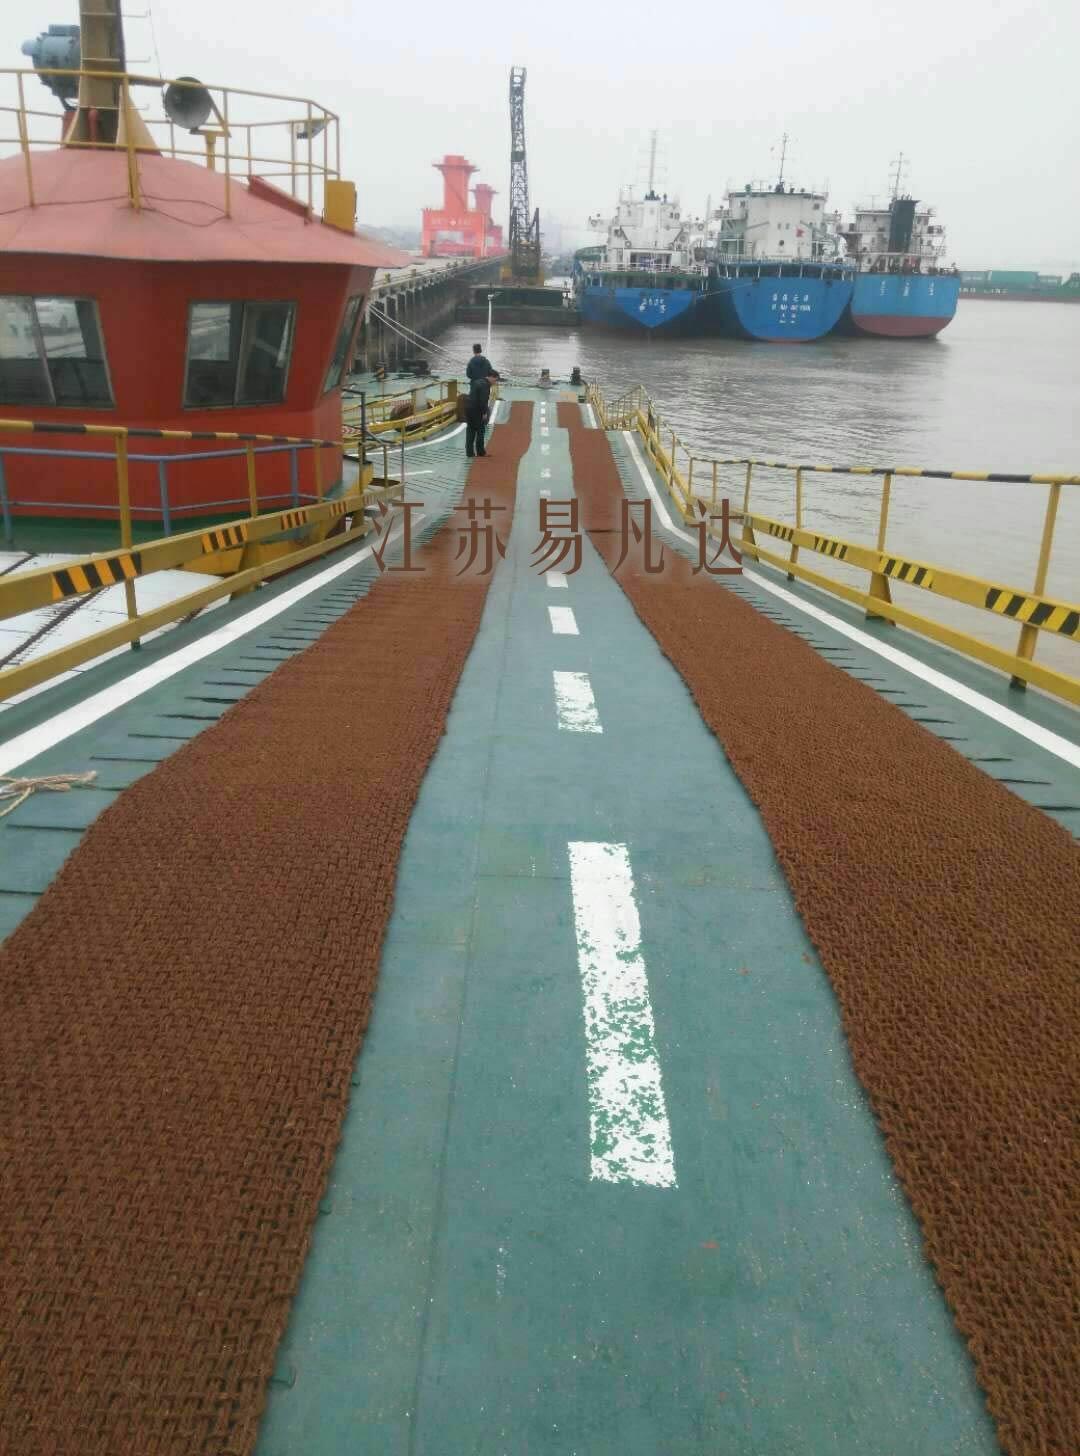 60cmX20m船用防滑棕垫,航道局专用防滑棕门地毯